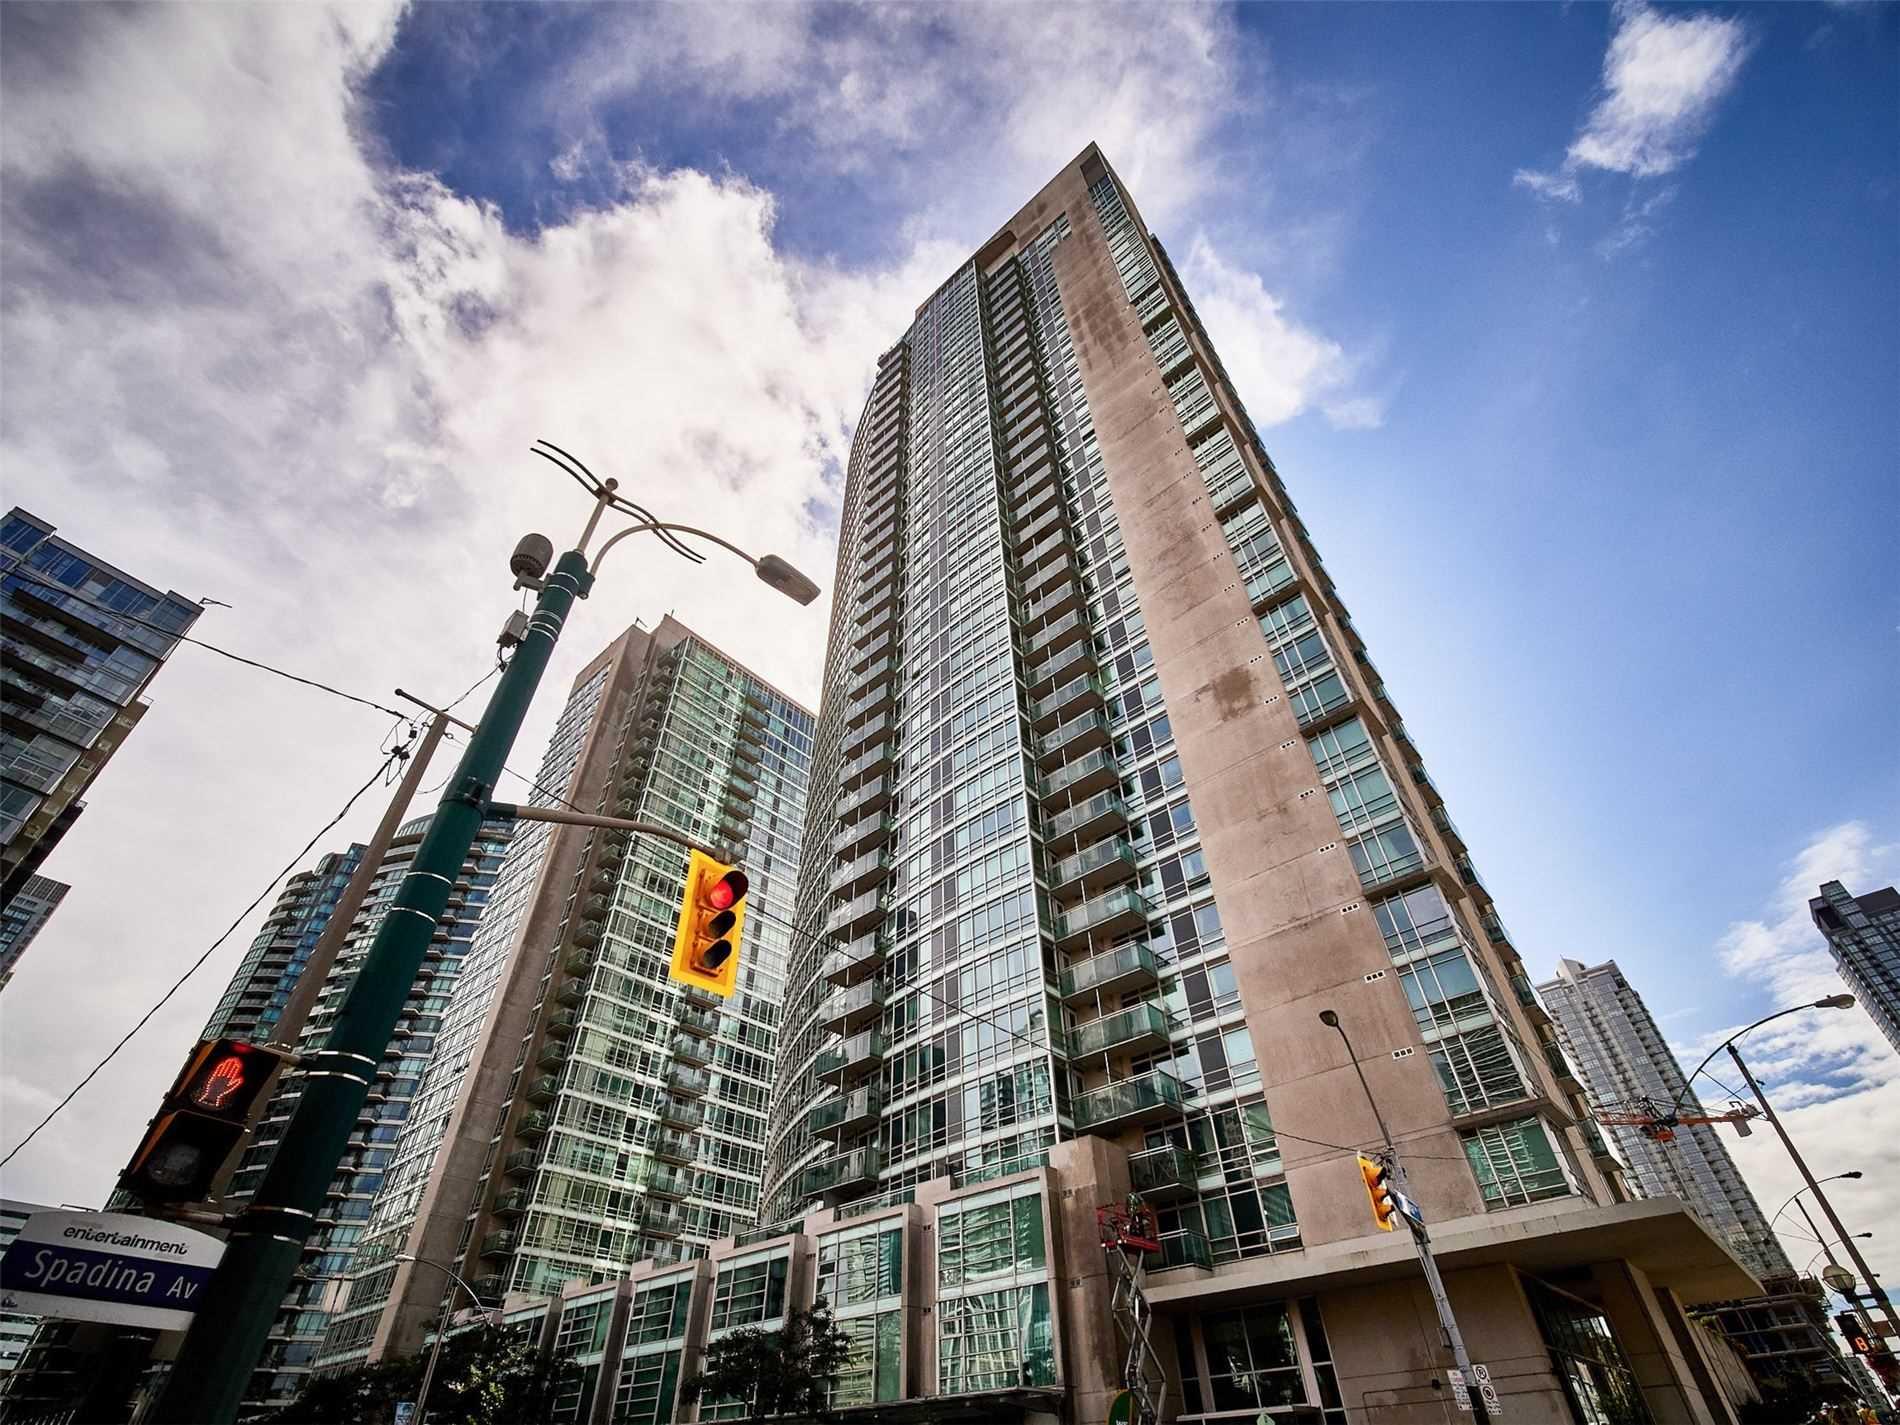 397 Front St W, Toronto